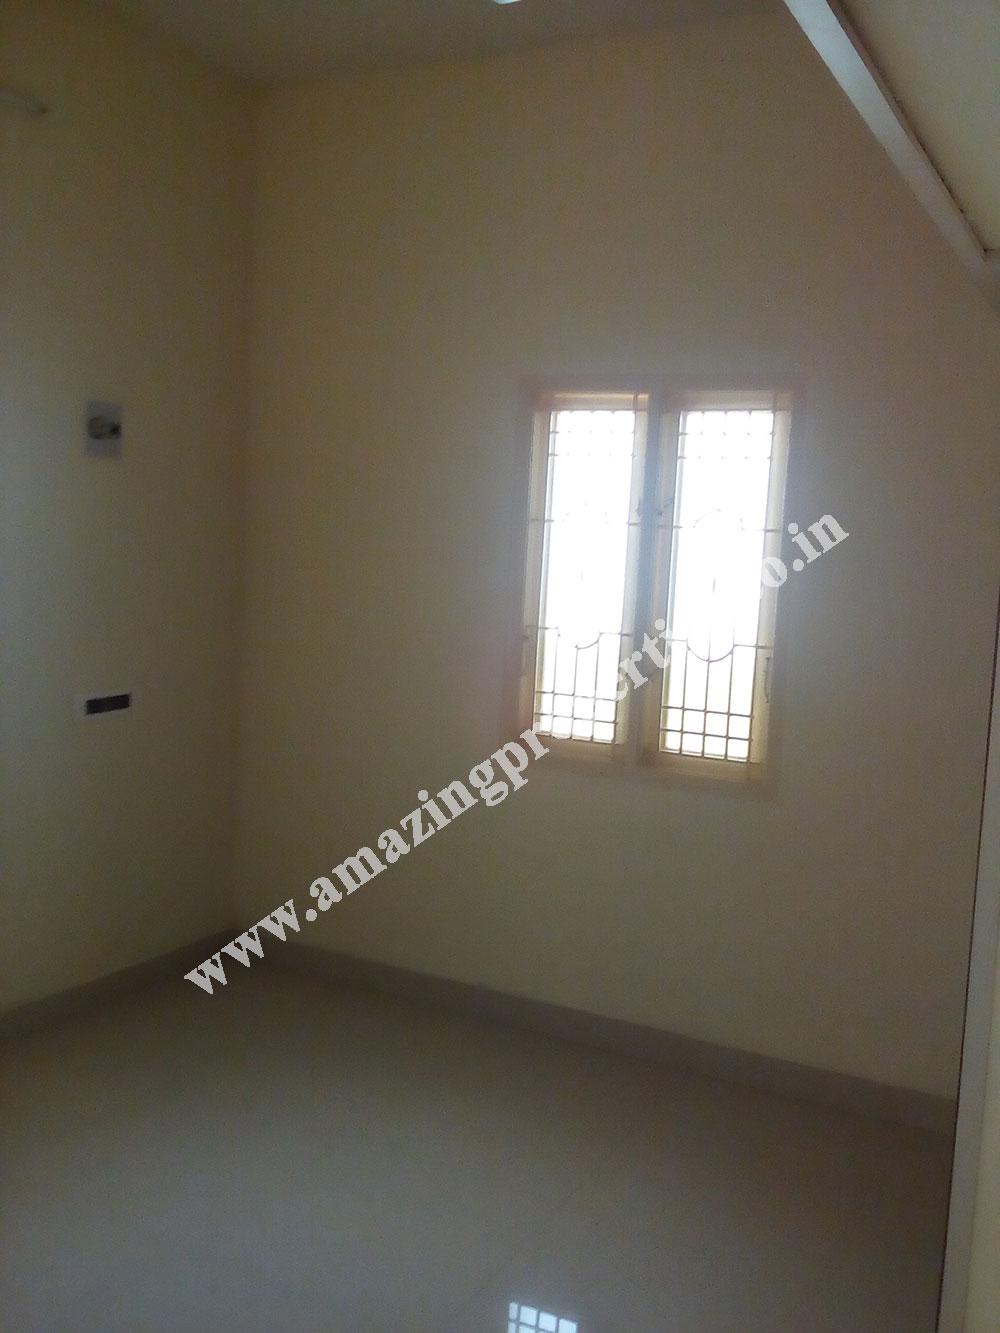 House for sale in NGO A Colony Tirunelveli